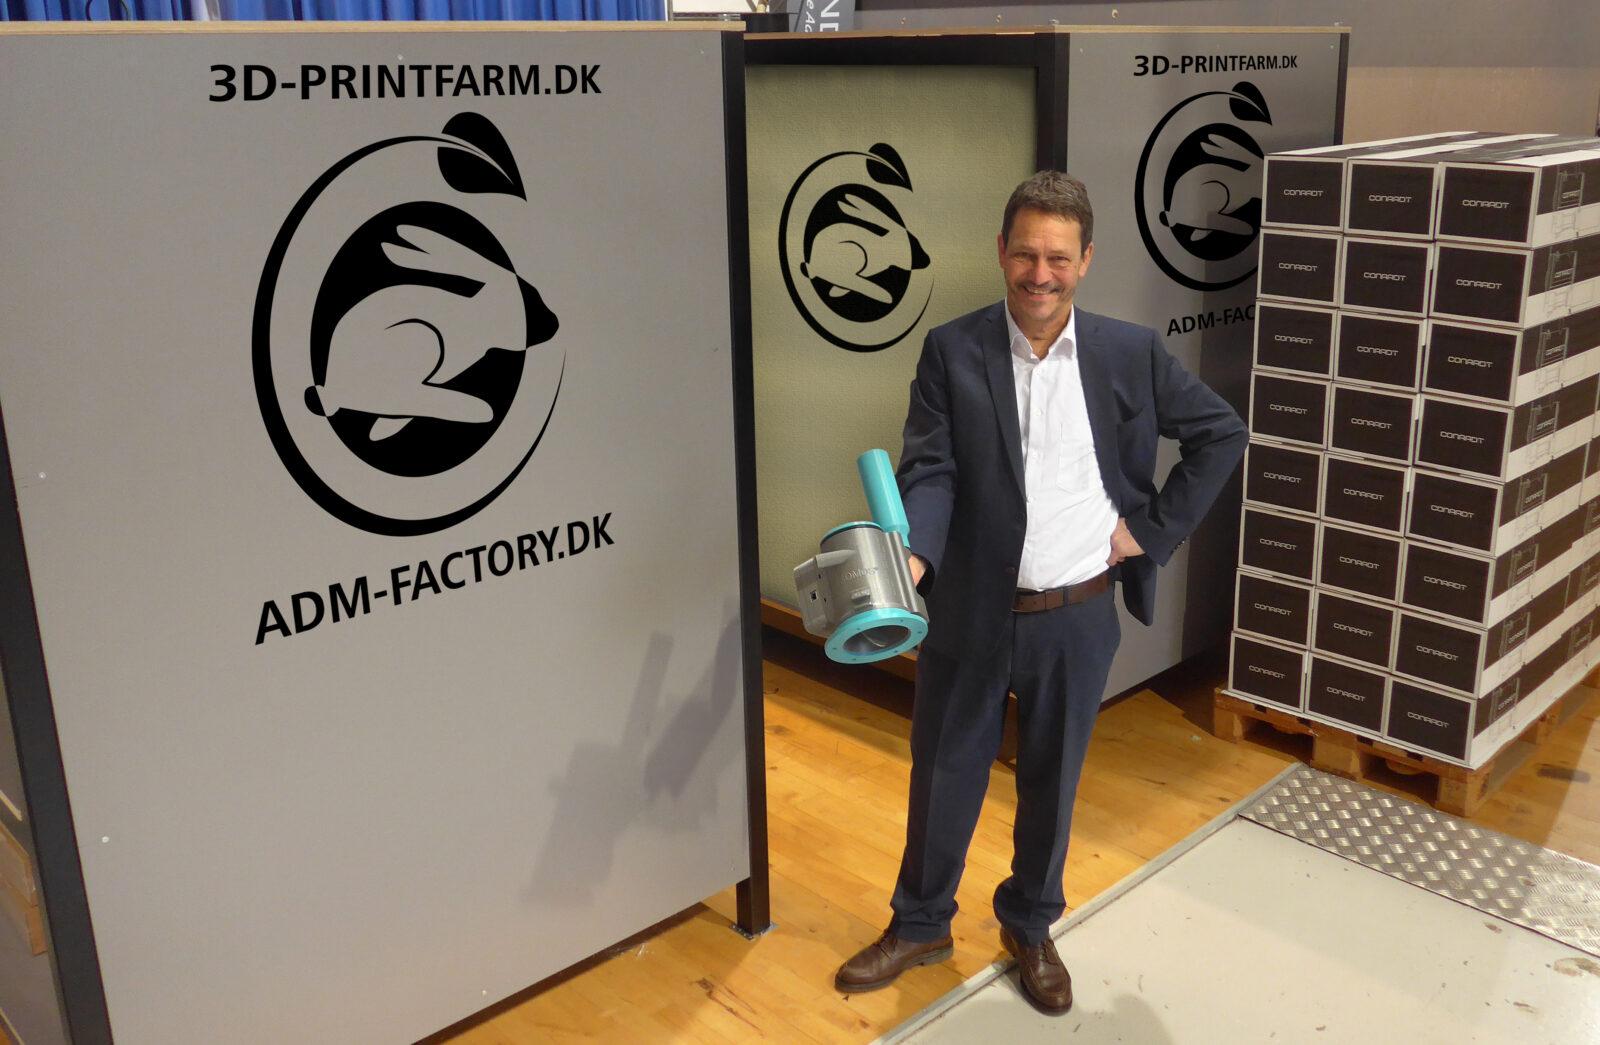 3D-printteknologi